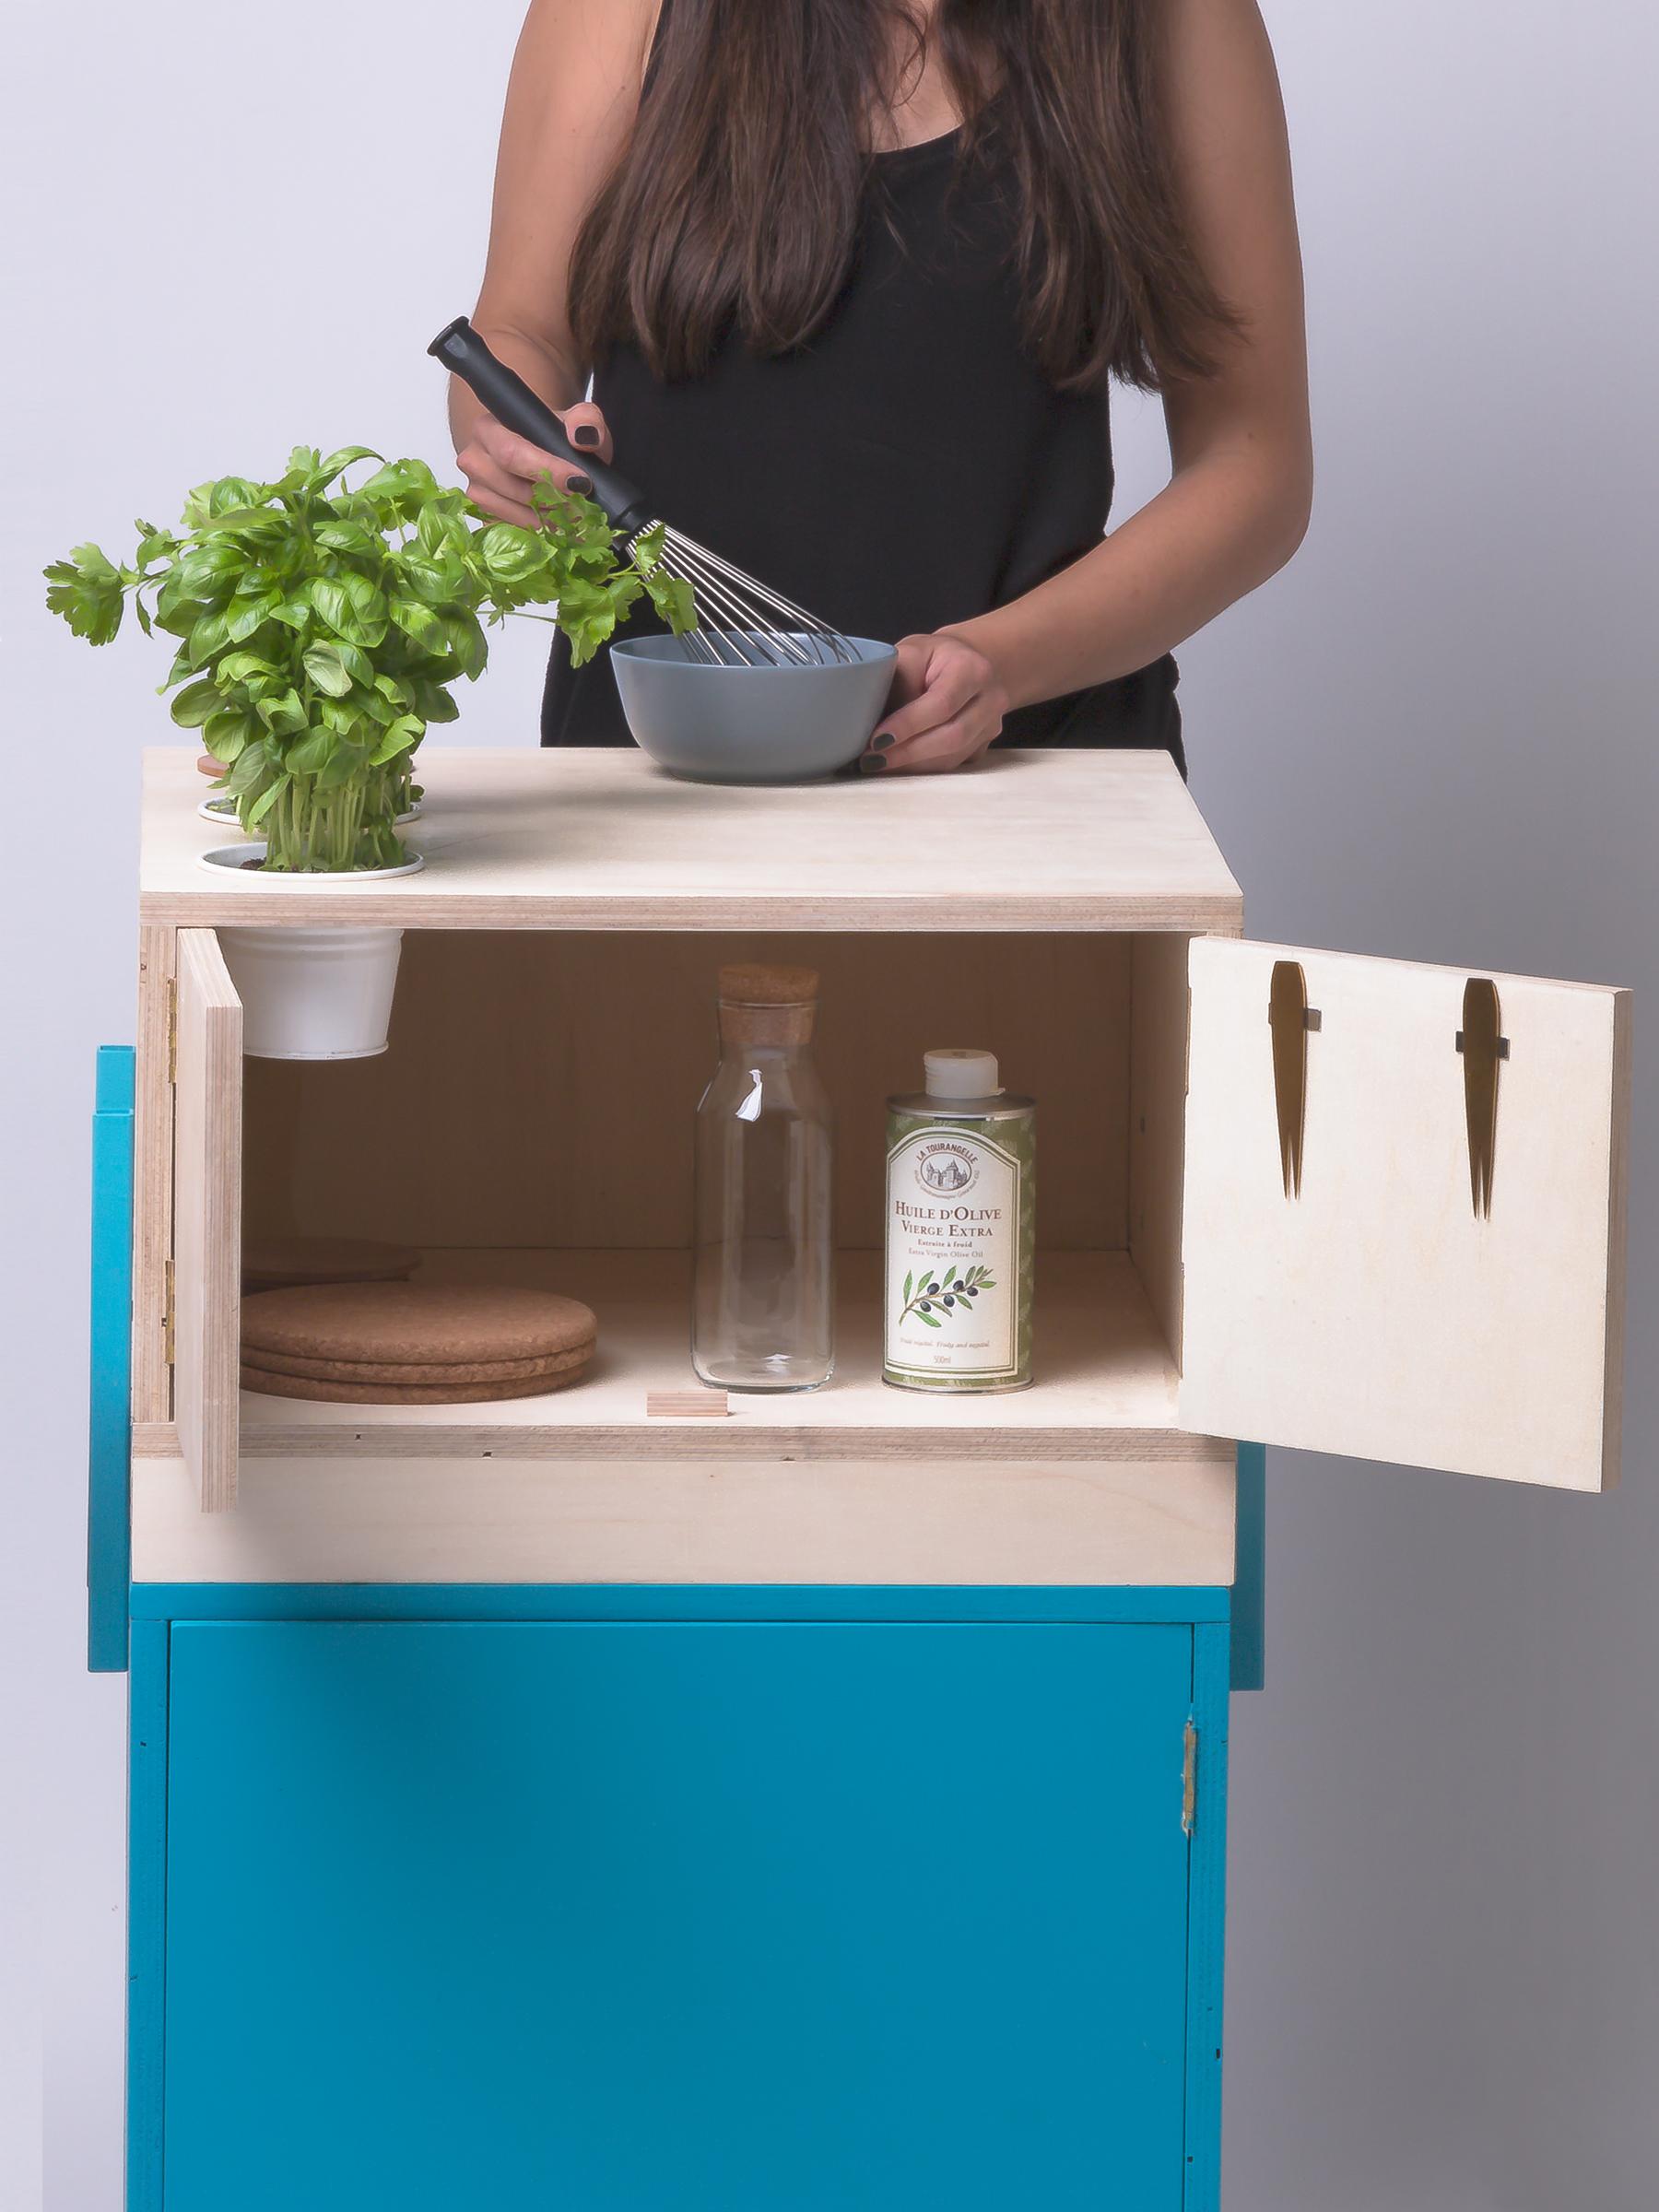 8-liberation-of-the-kitchen.jpg